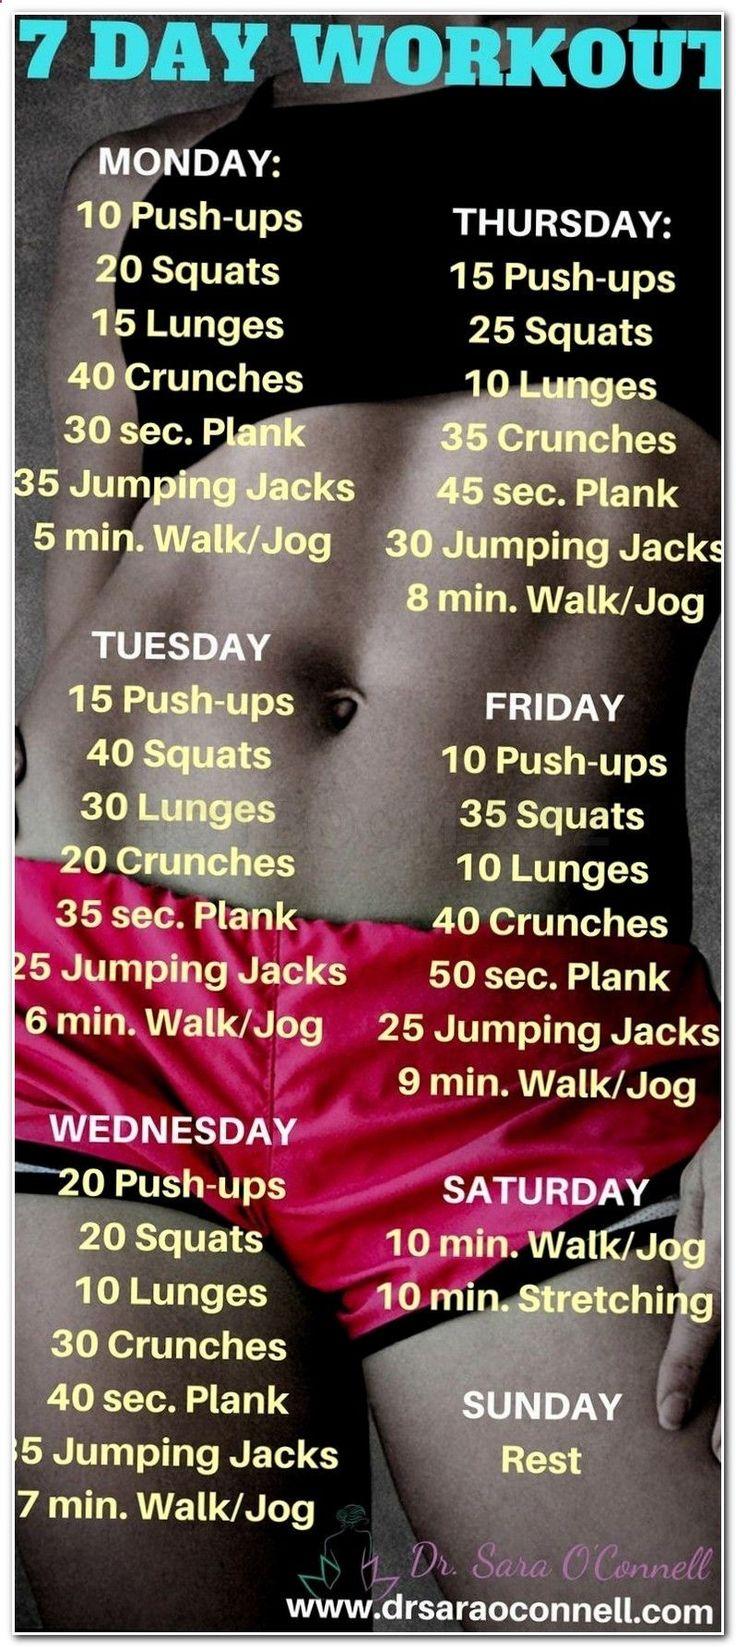 how to lose weight around waist